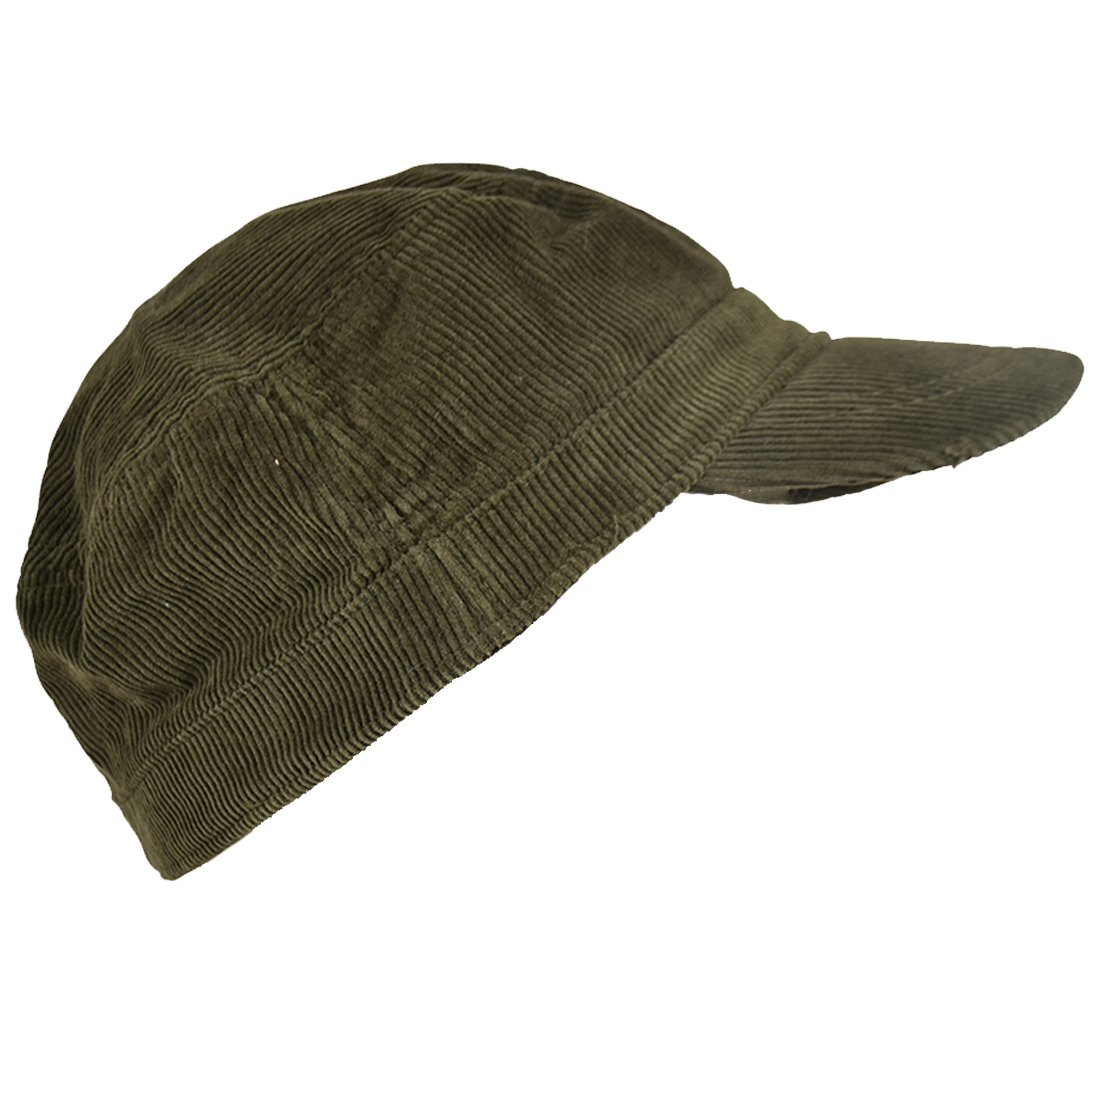 Landana Headscarves Corduroy Military Hat Olive Green Cadet Cap at Amazon  Men s Clothing store  4d57446ba6b